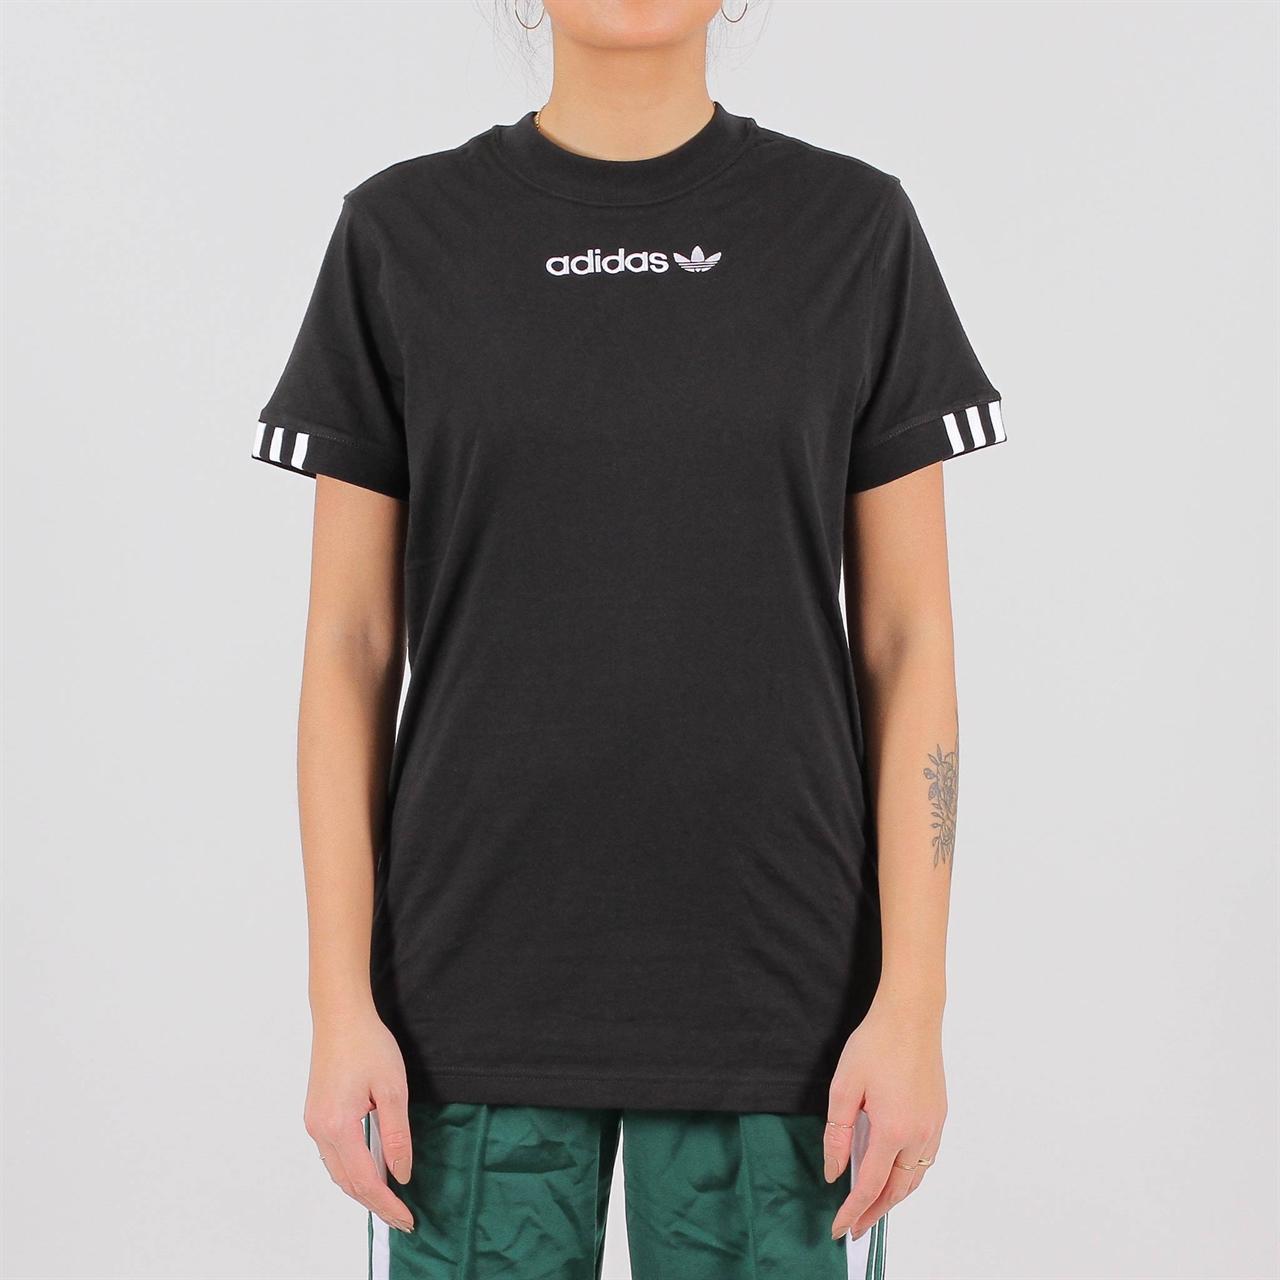 423c71f568c Adidas Originals Womens Coeeze T-Shirt (DU7190) - Shelta